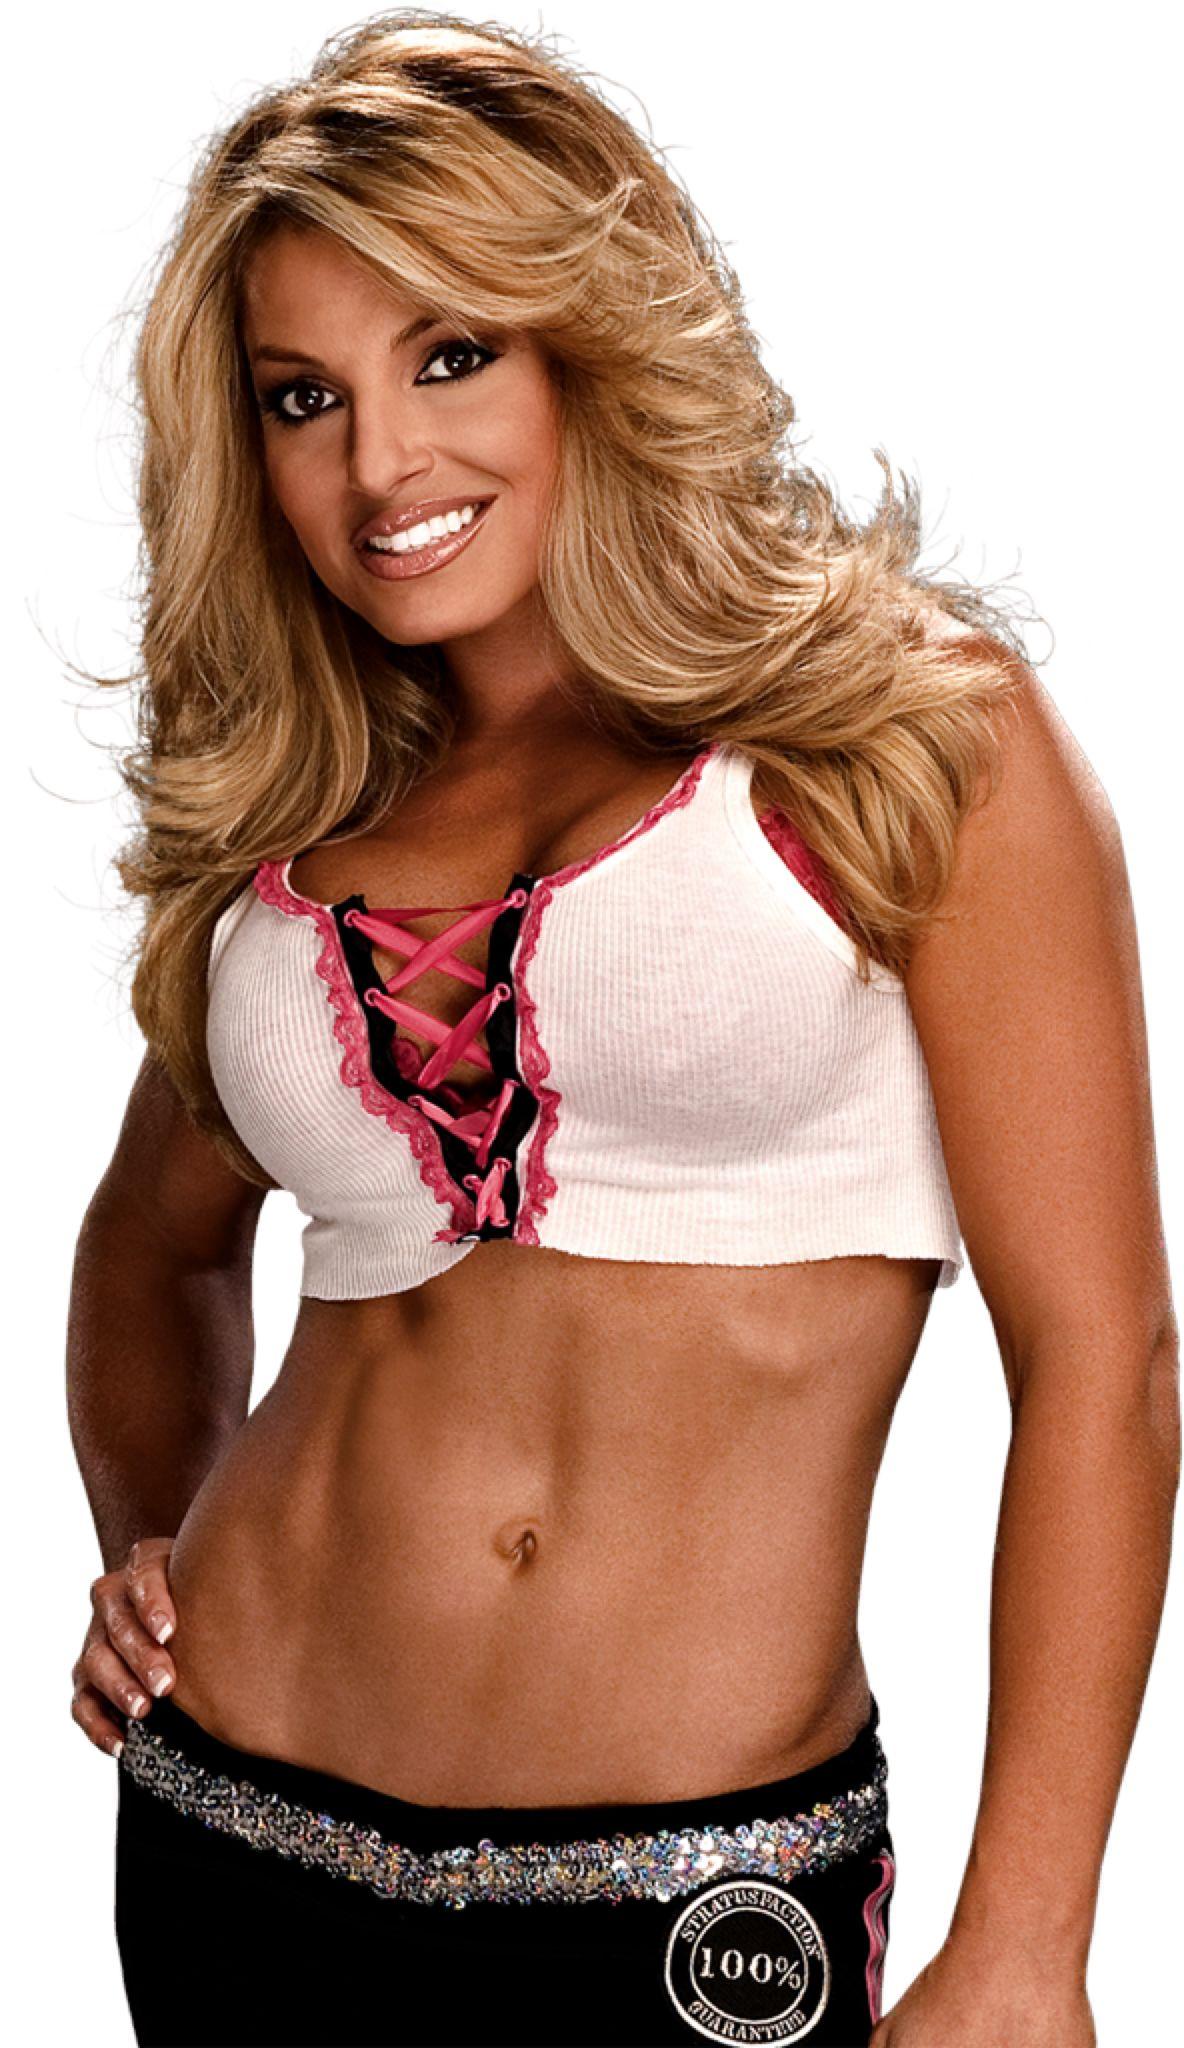 Trish Stratus Png By Ambriegnsasylum16 On Deviantart Trish Stratus Female Wrestlers Fitness Model